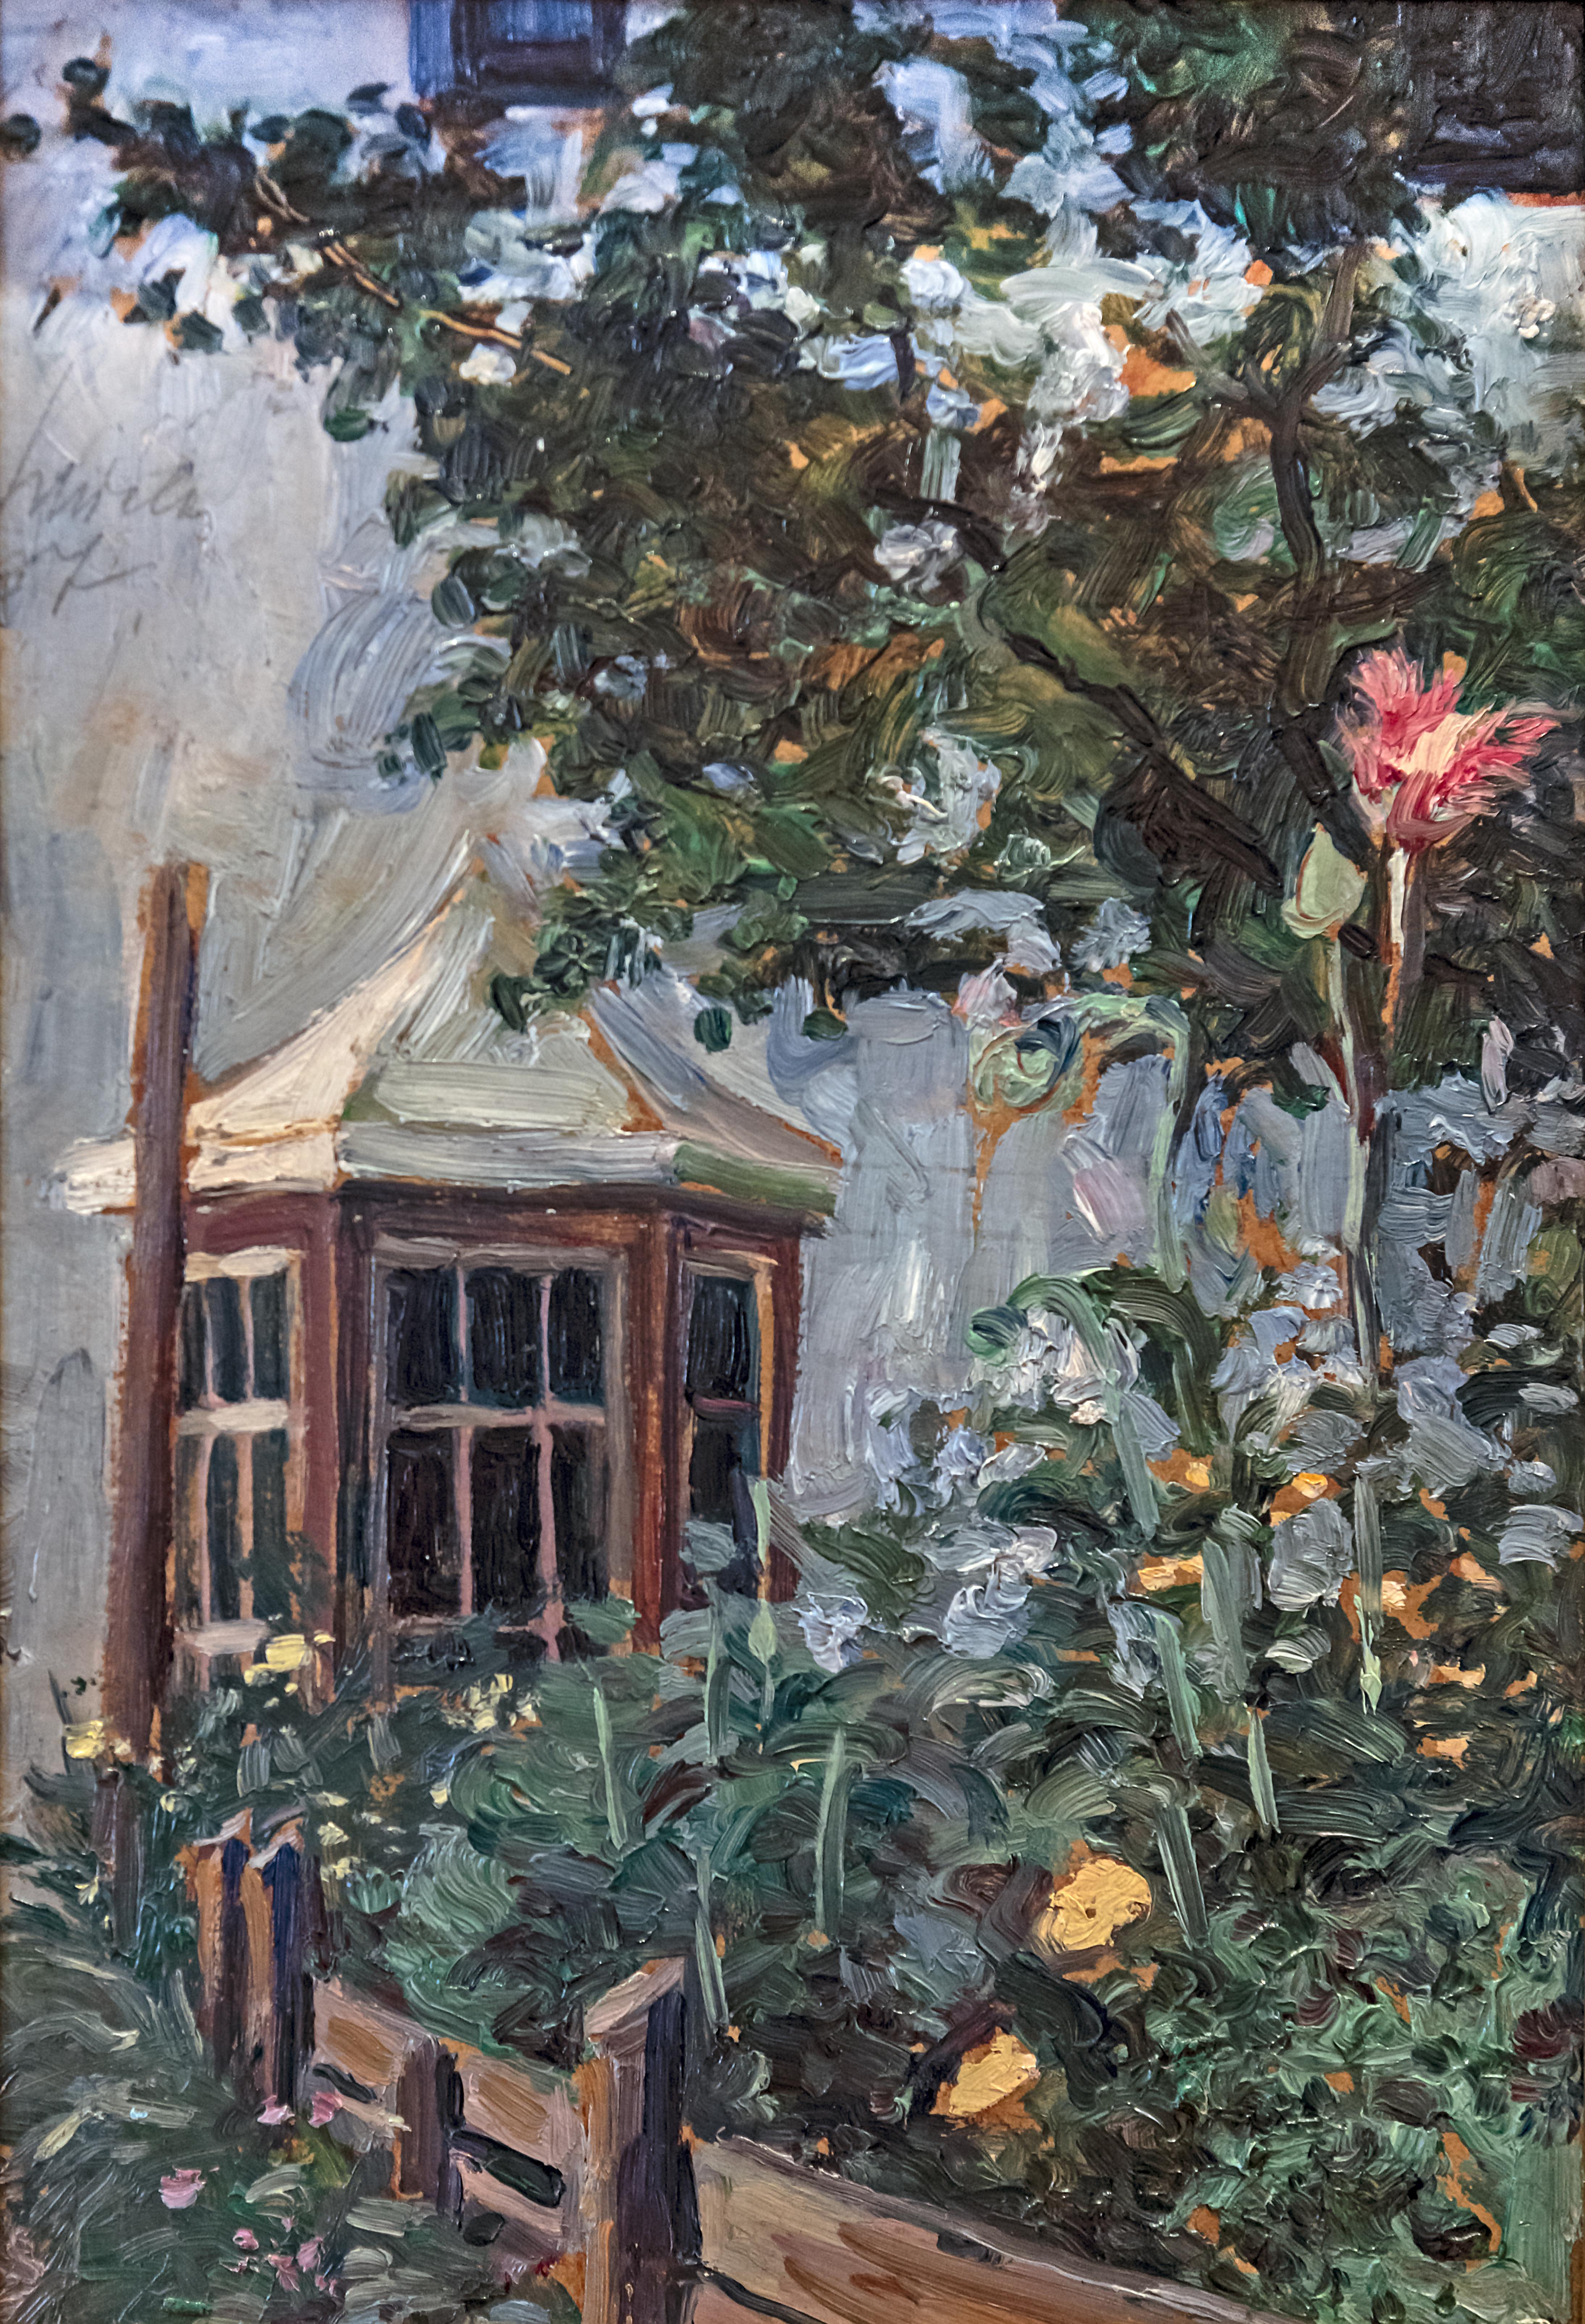 File:Bemberg Fondation Toulouse - Jardin fleuri - Egon Schiele.jpg ...